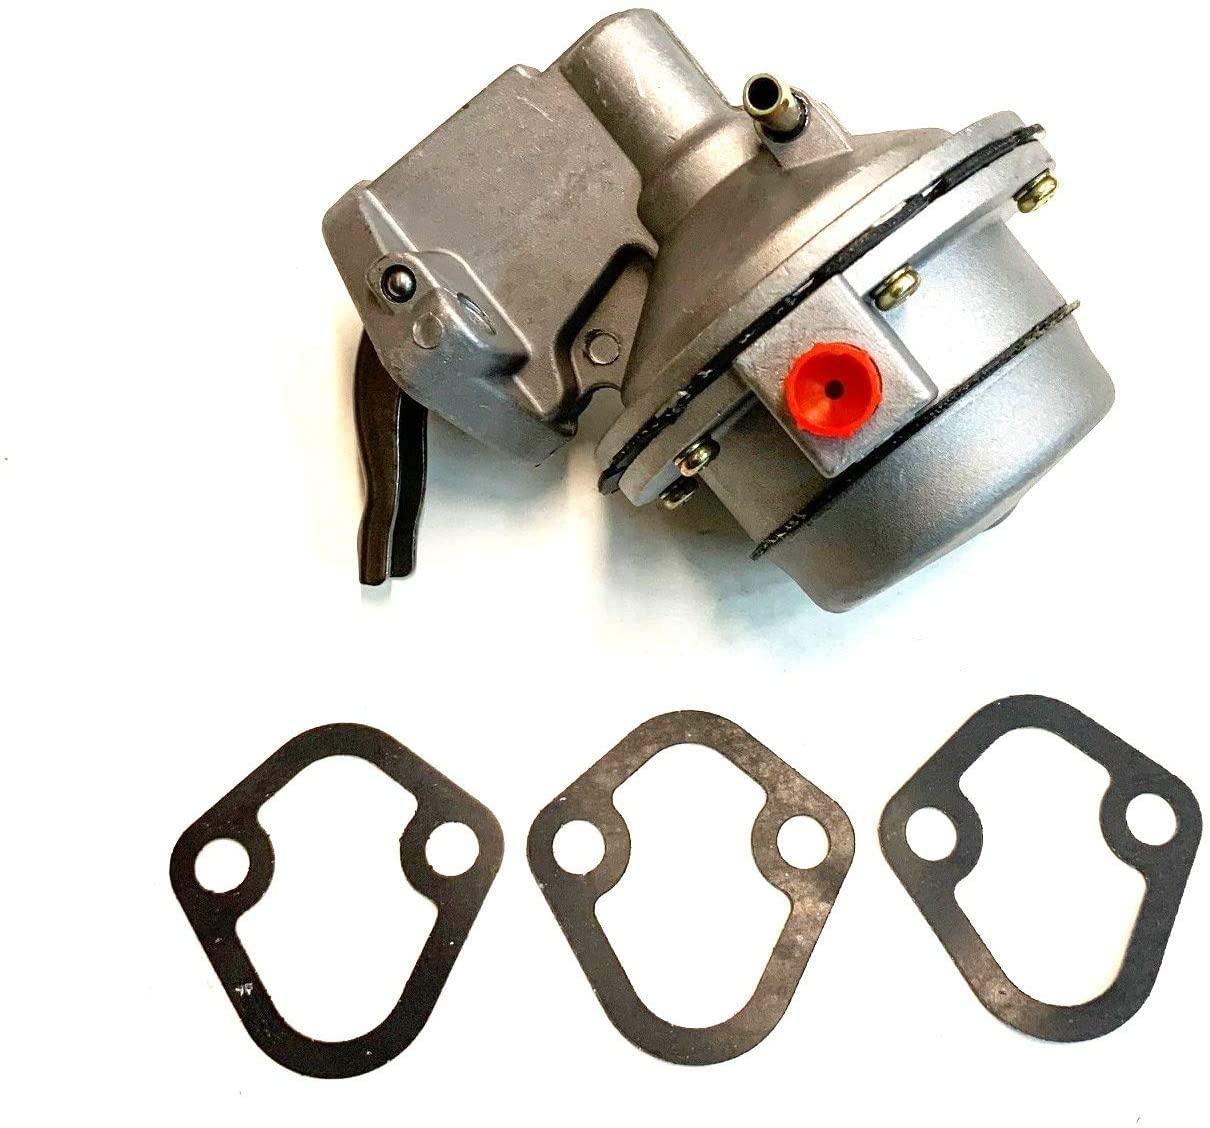 Sea Water Fuel Pump for Mercury Mercruiser 454 502 7.4L 8.2L Replaces 812454A1 862048A1 812454A3 60601 M60601 18-7288 187288 18 7288